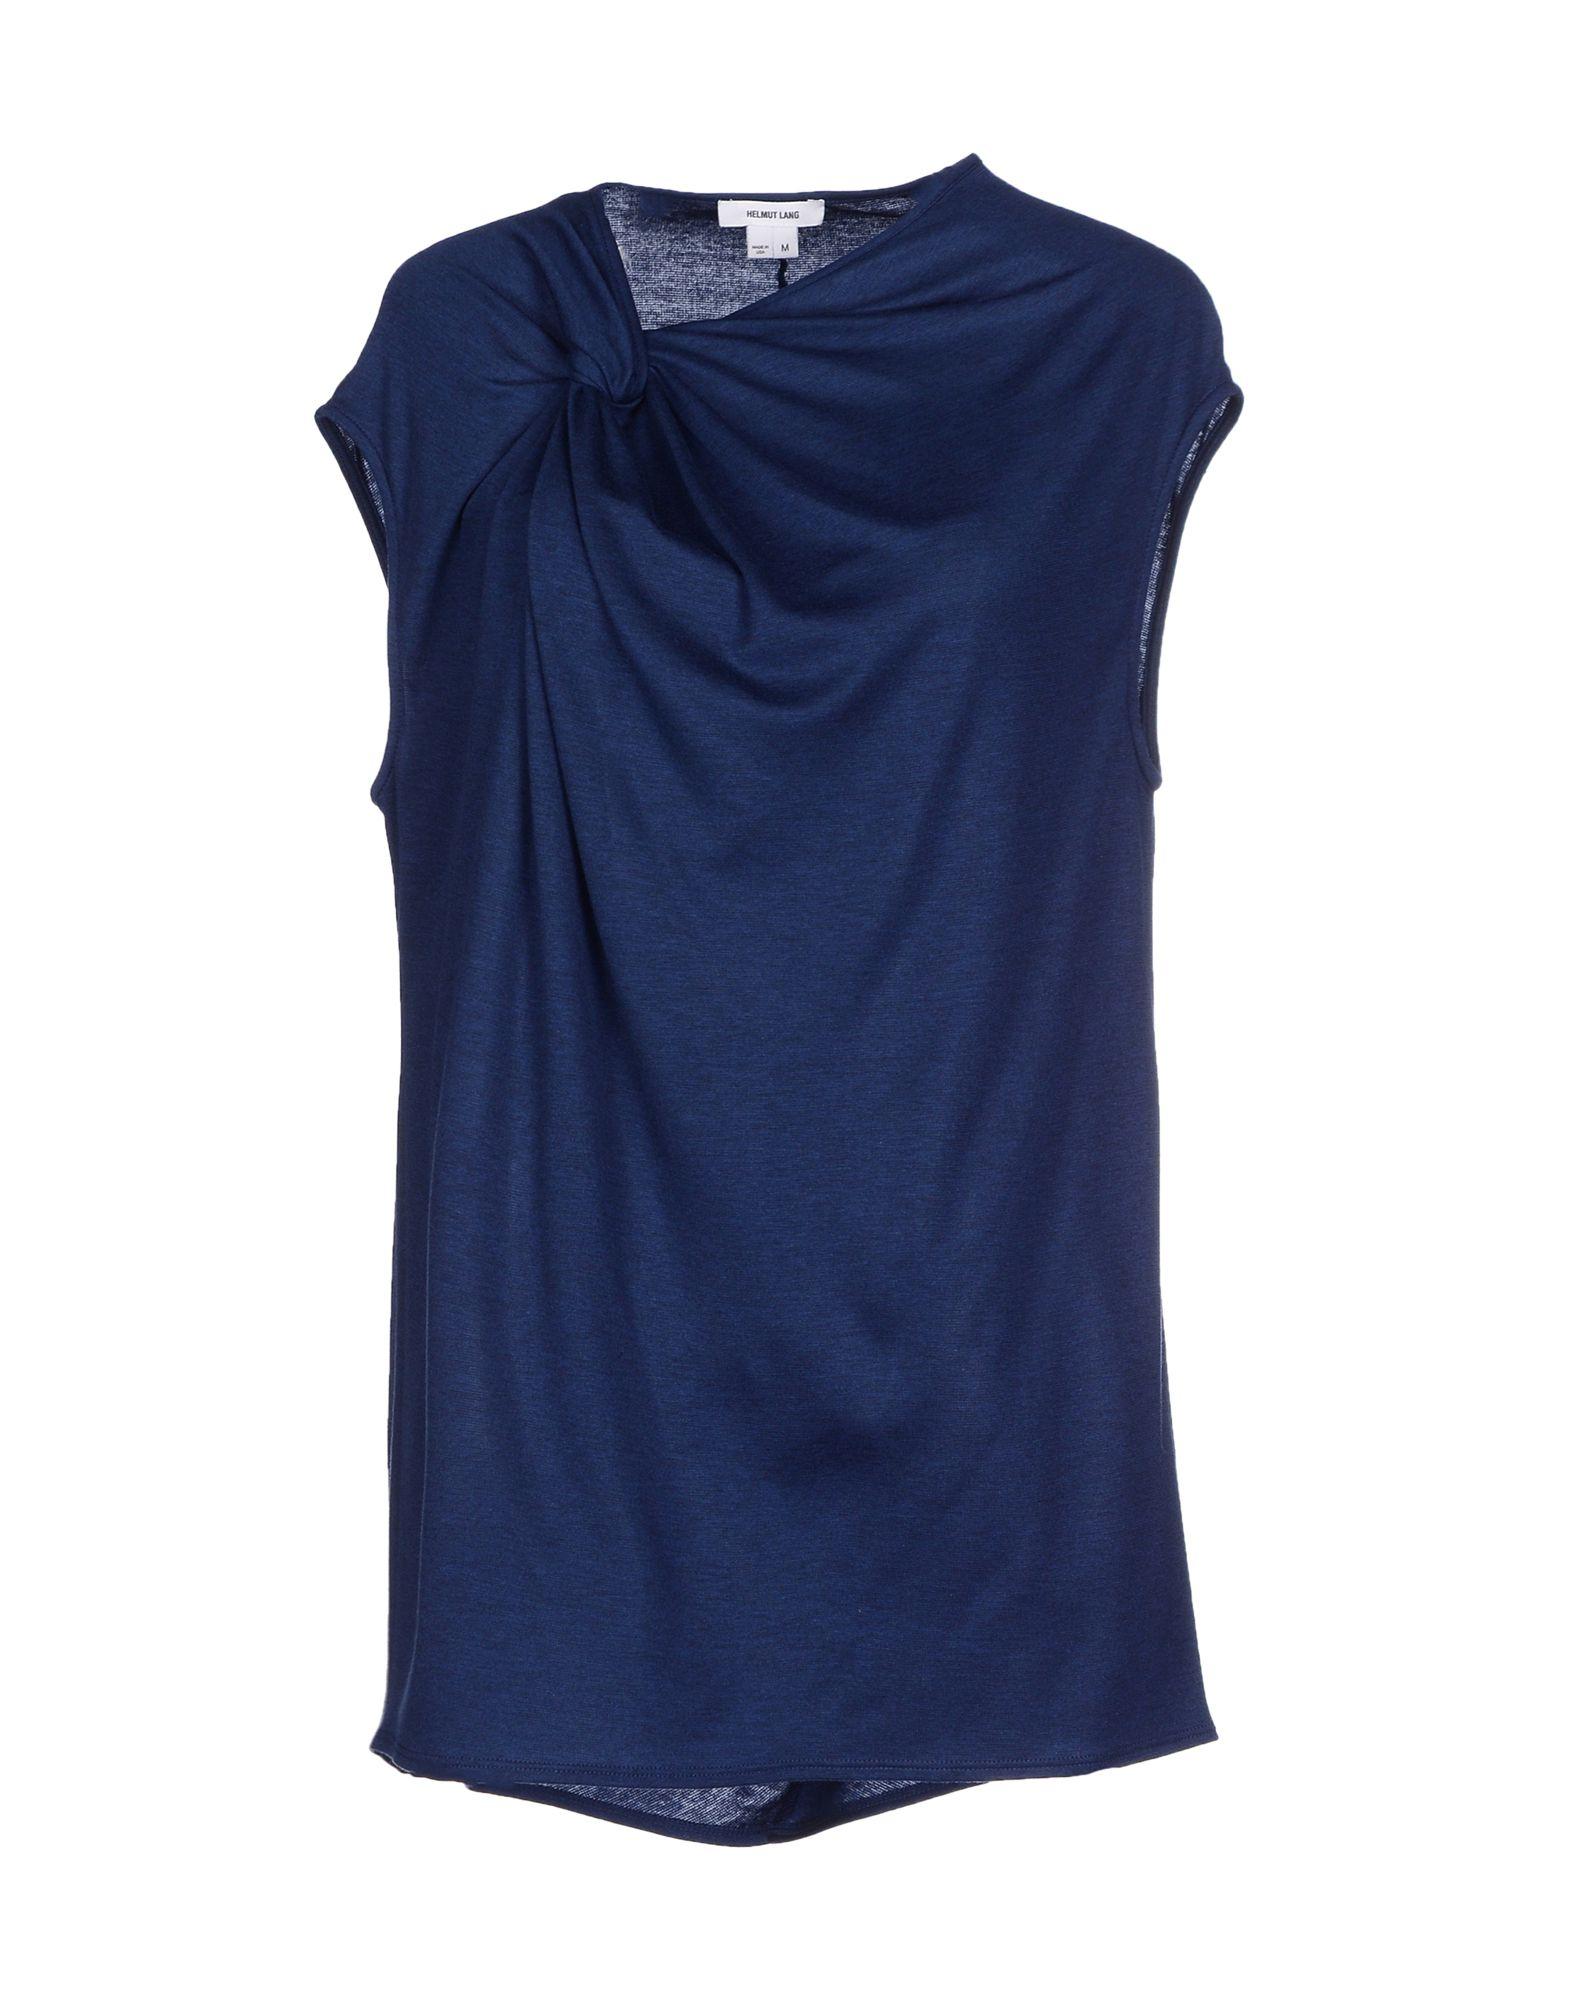 Helmut lang t shirt in blue lyst for Helmut lang t shirt